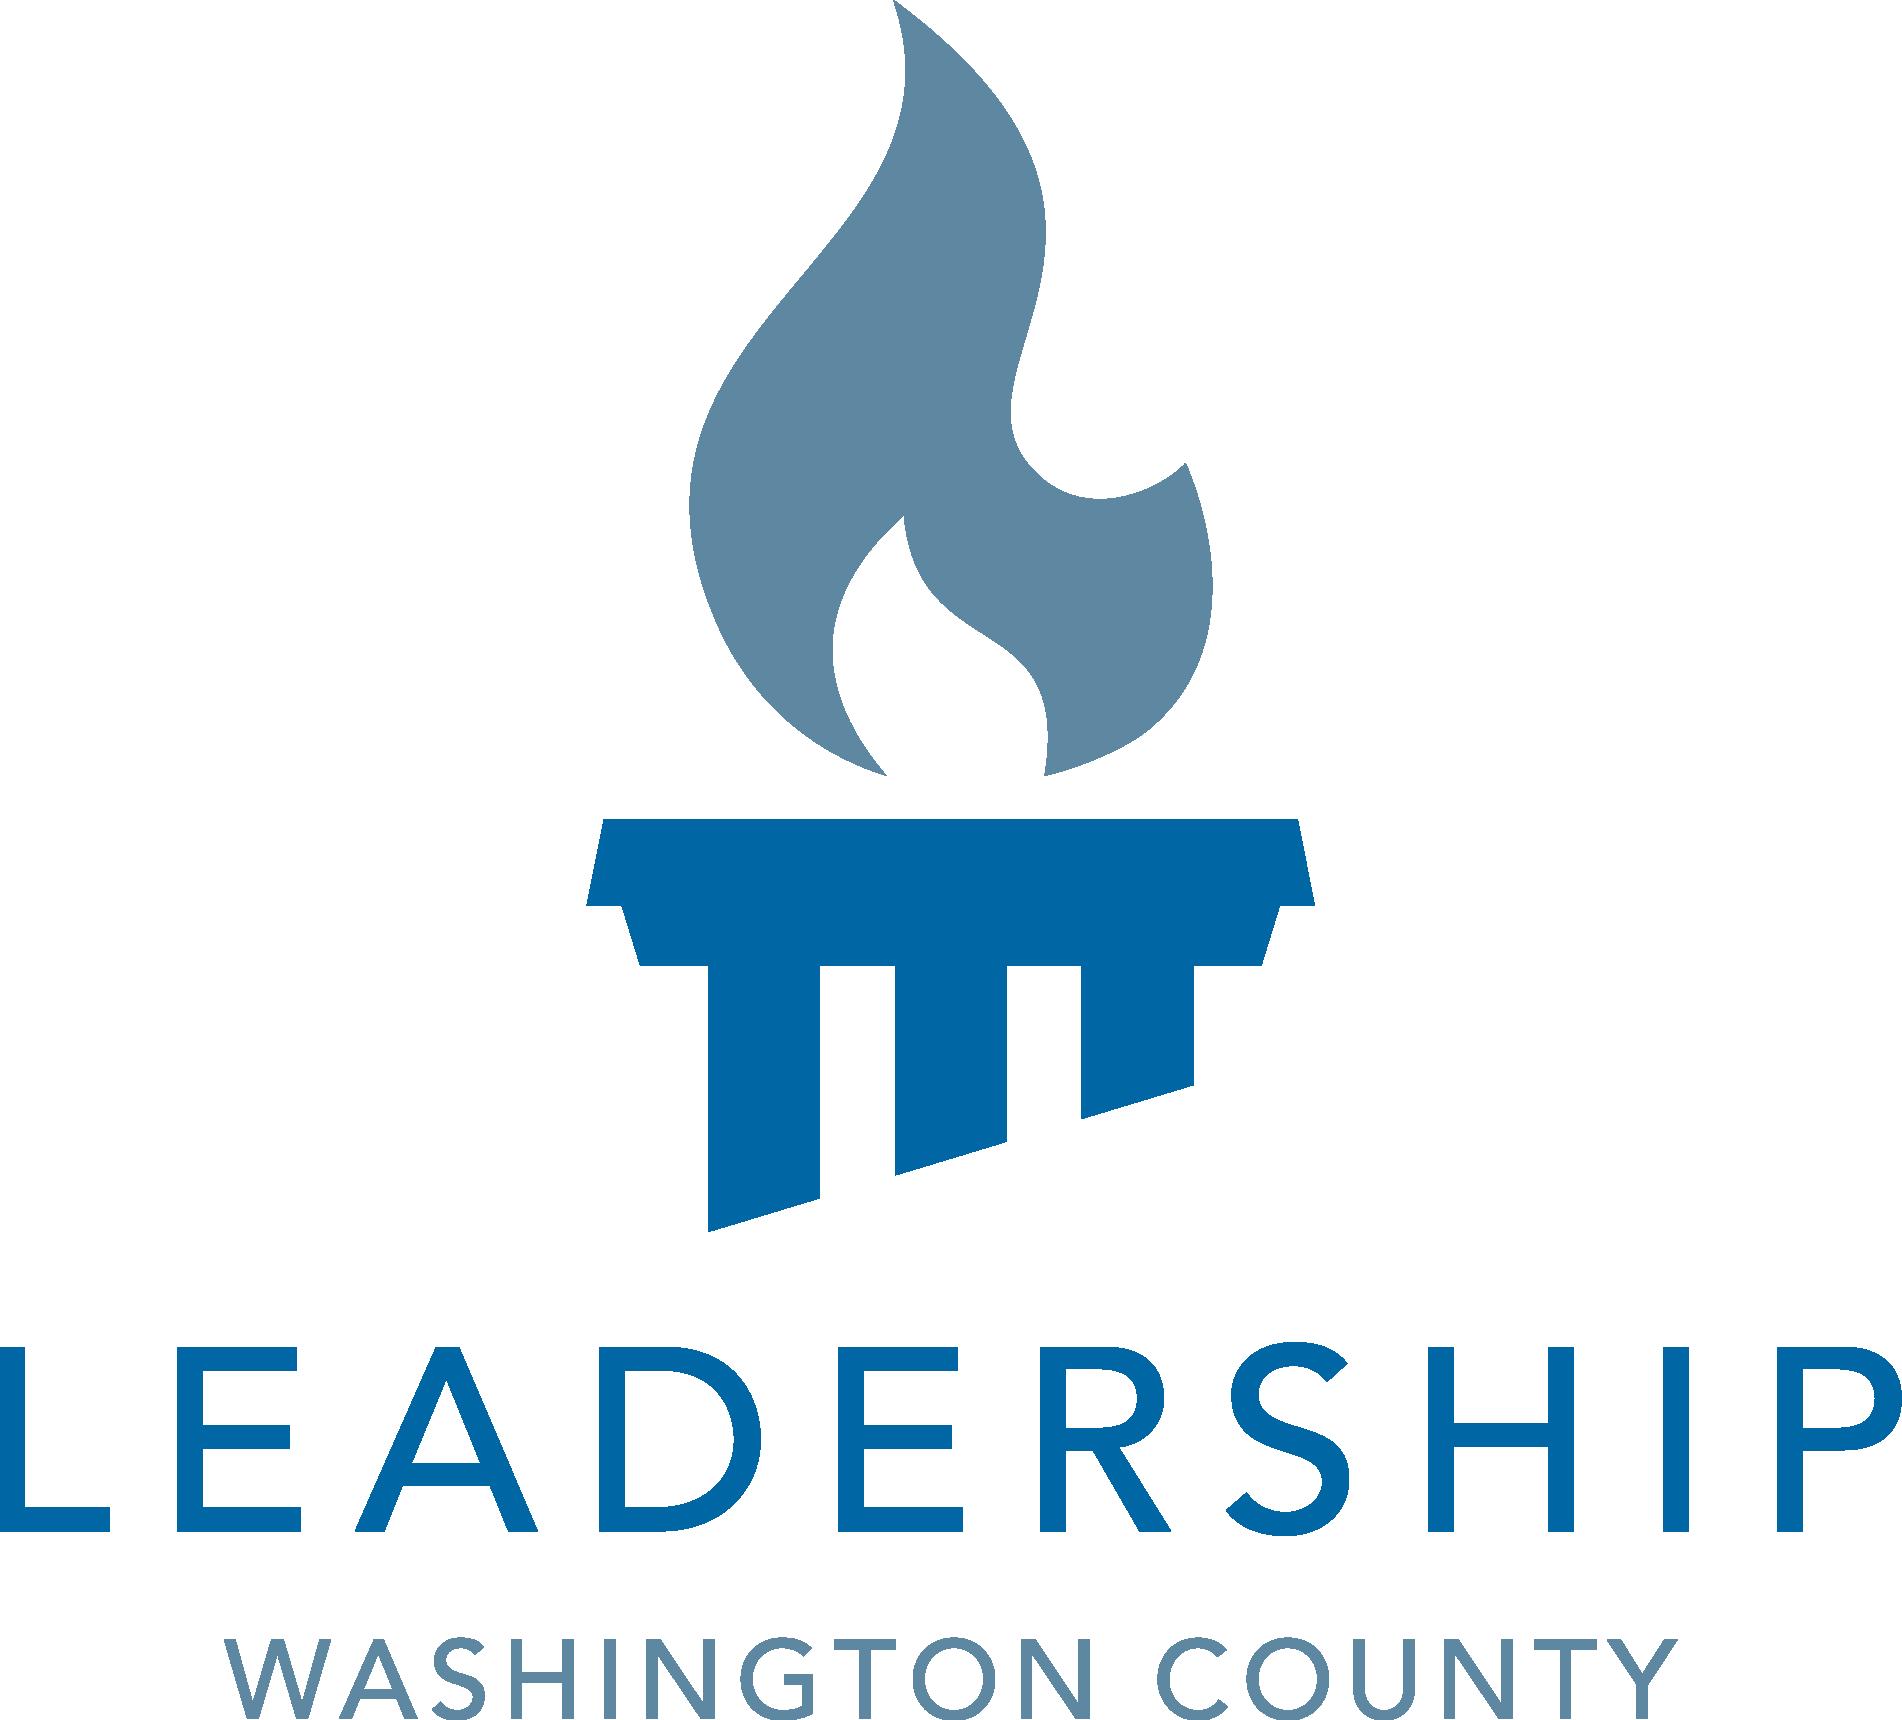 Logo for Leadership Wash. Co